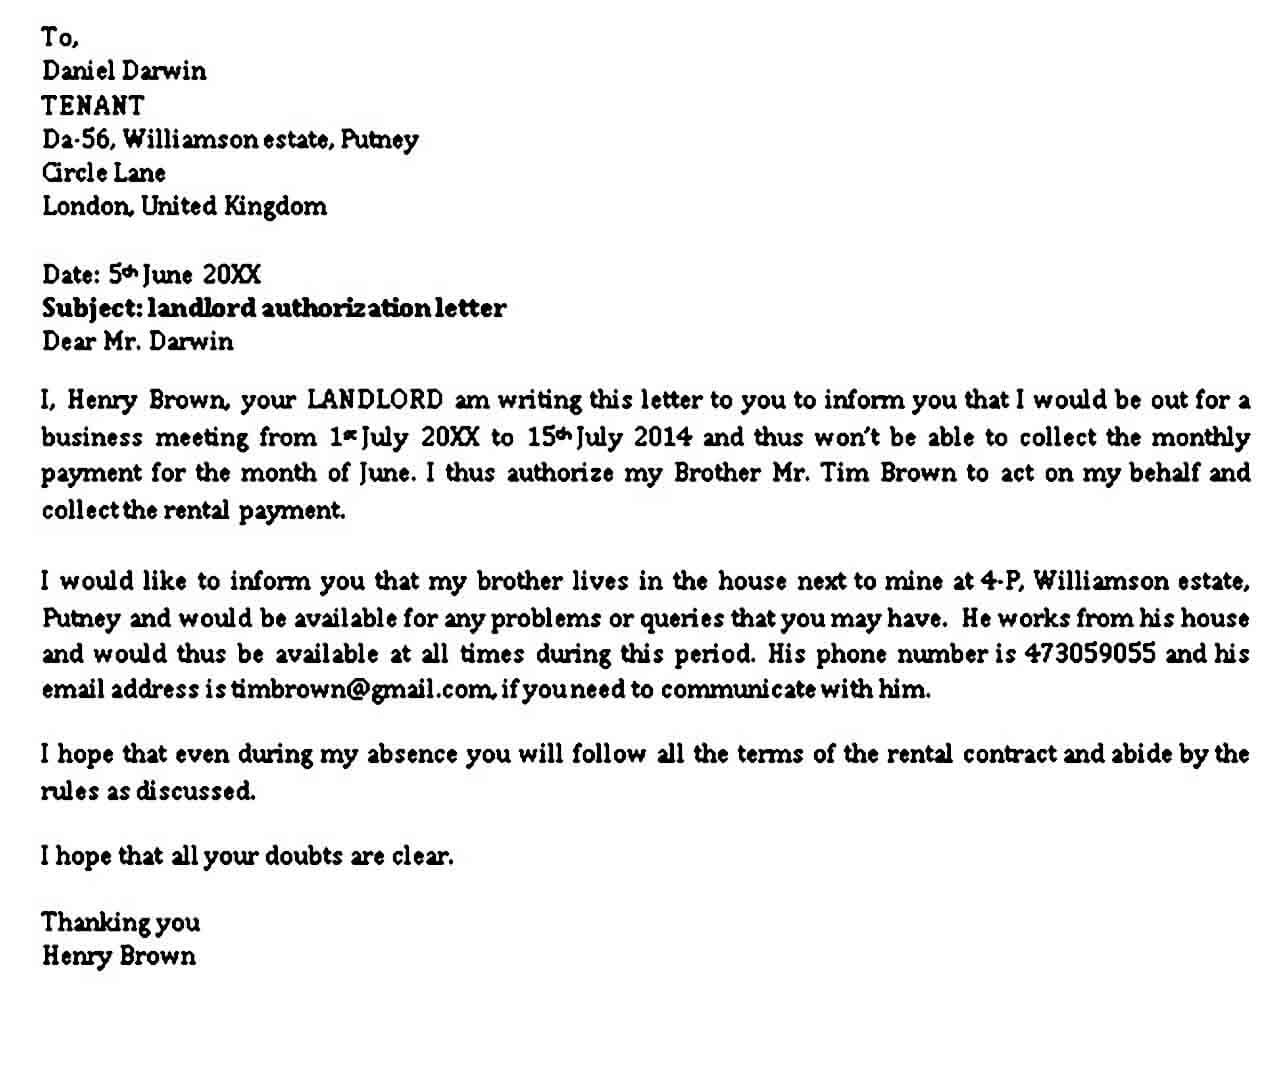 Landlord Authorization Letter